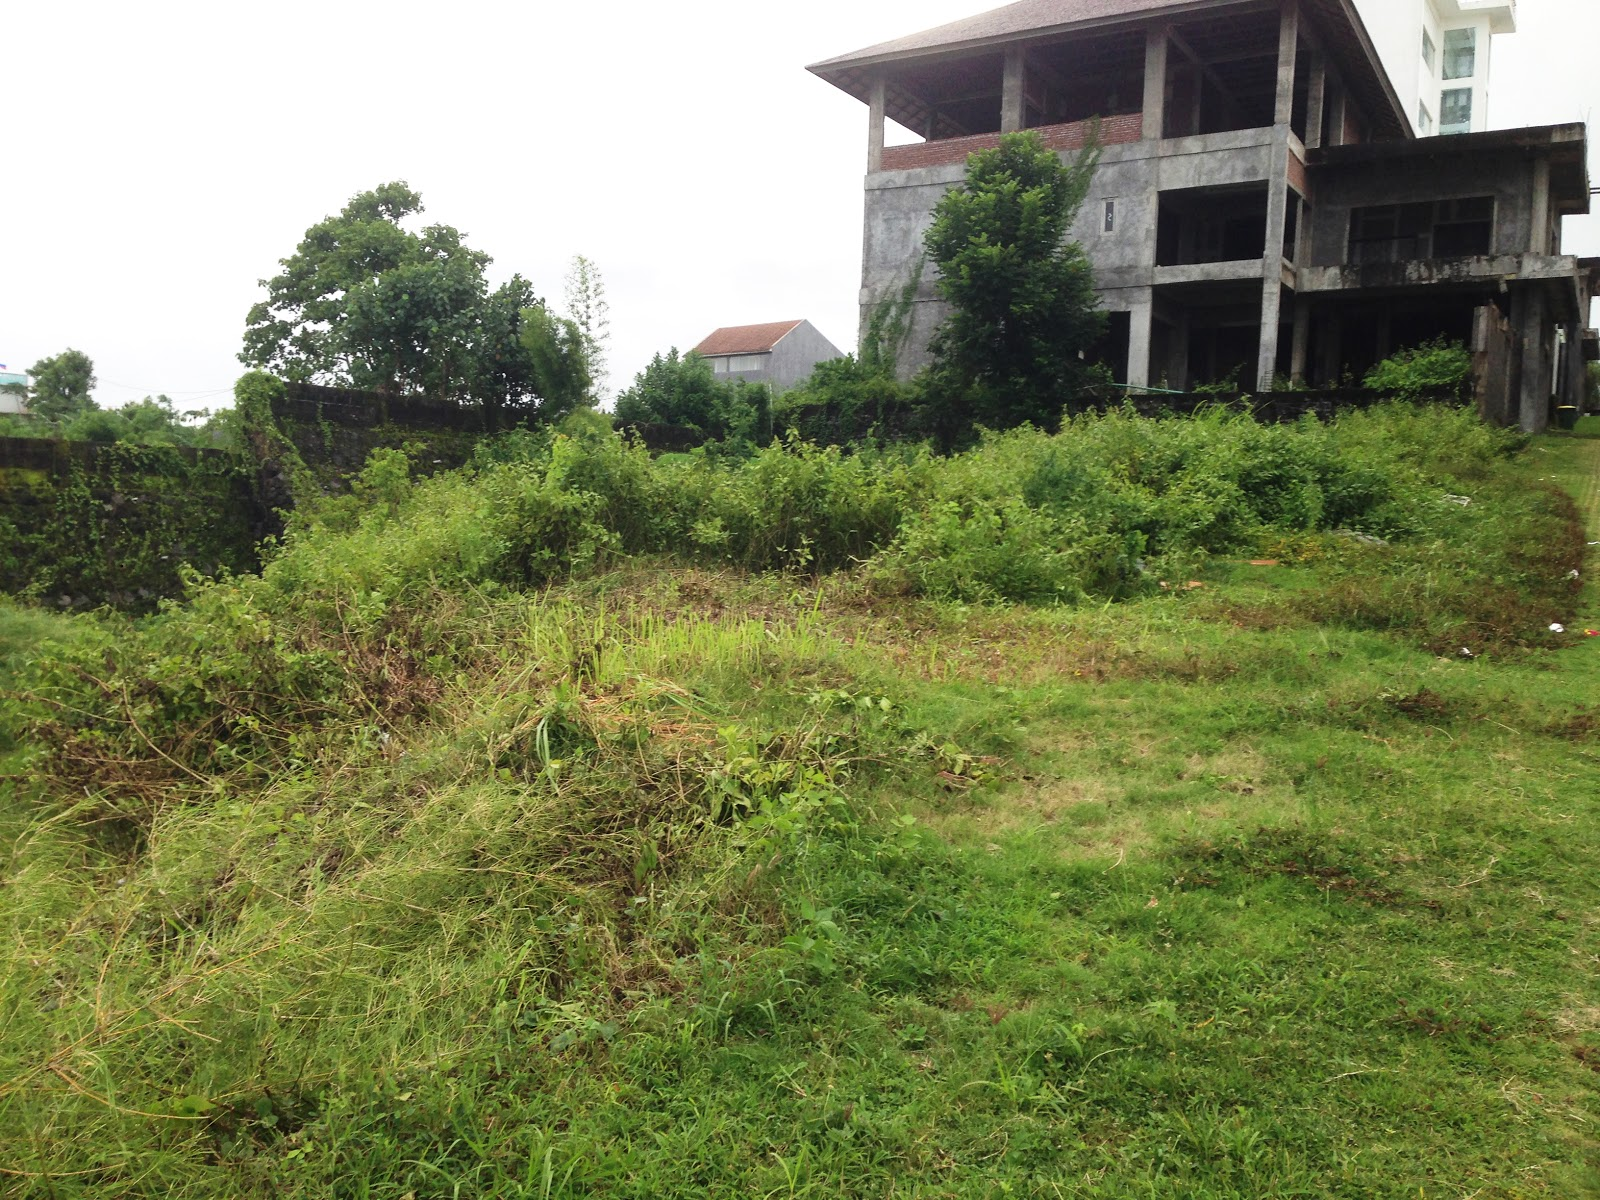 BUC dijual tanah goa gong Ungasan bali di perumahan Elit pinggir jalan utama sebelah selatan atas kampus udayana nusa dua bali